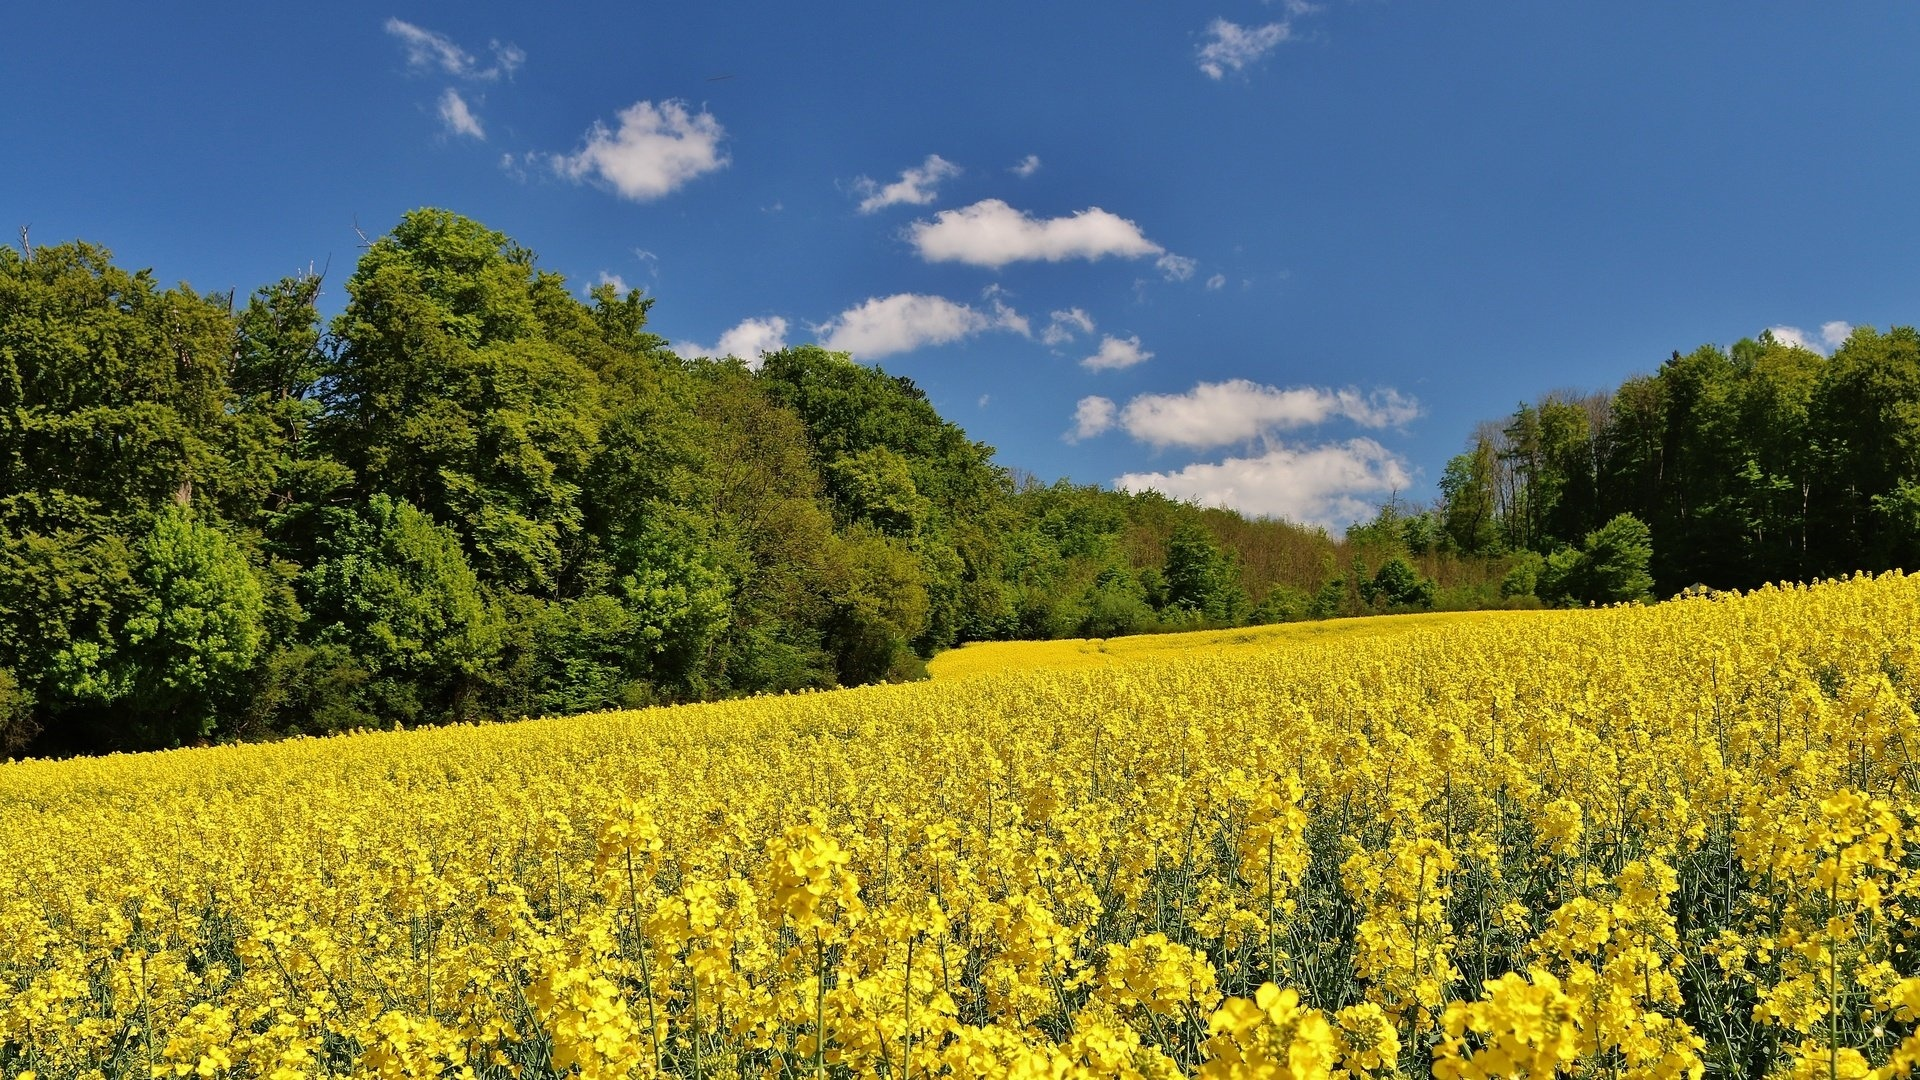 Yellow Nature free pic